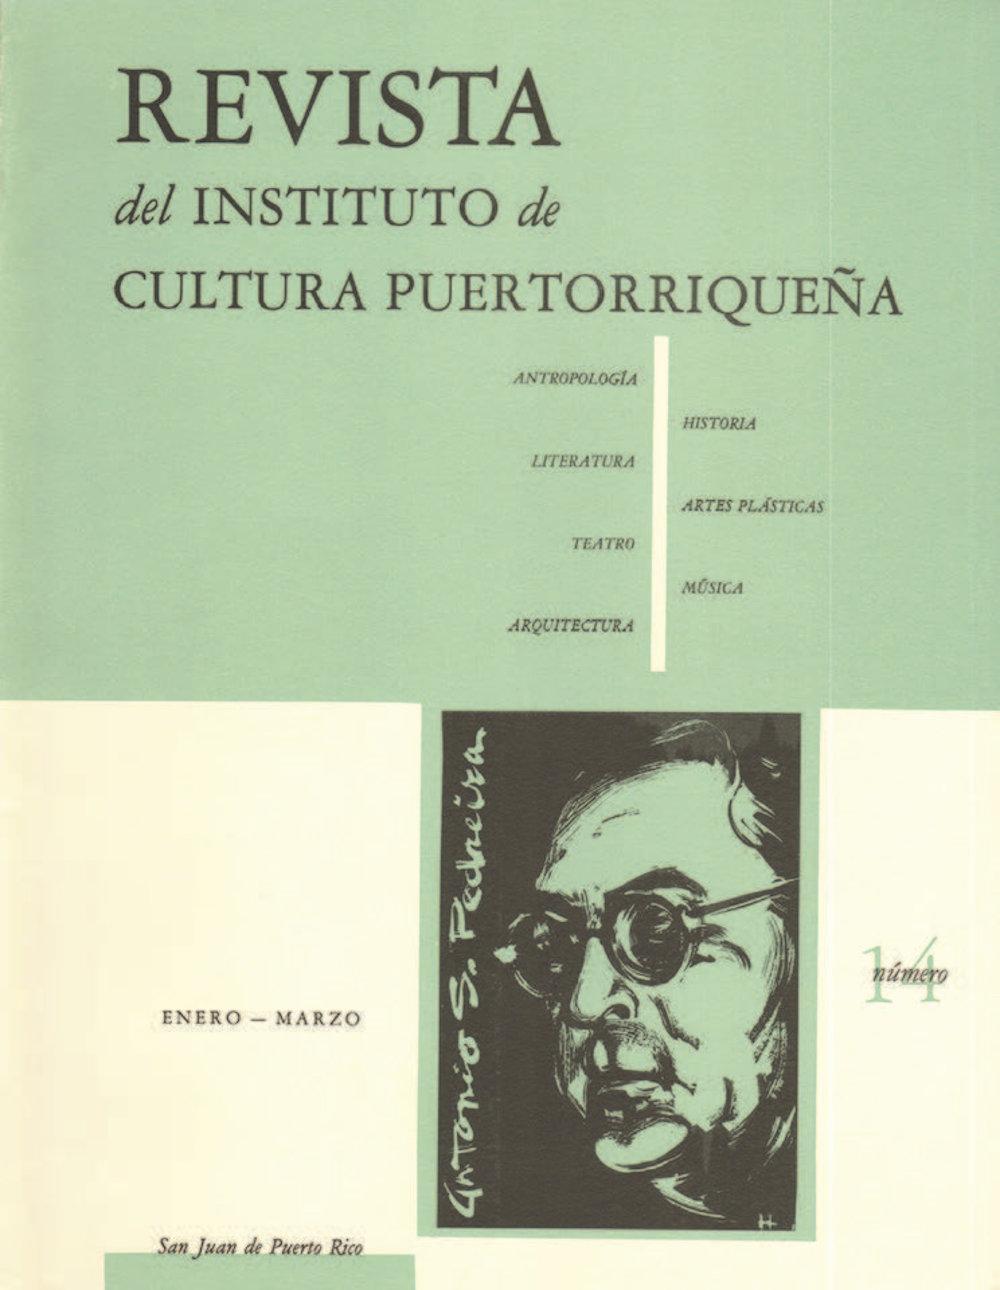 Número 14 / 1962